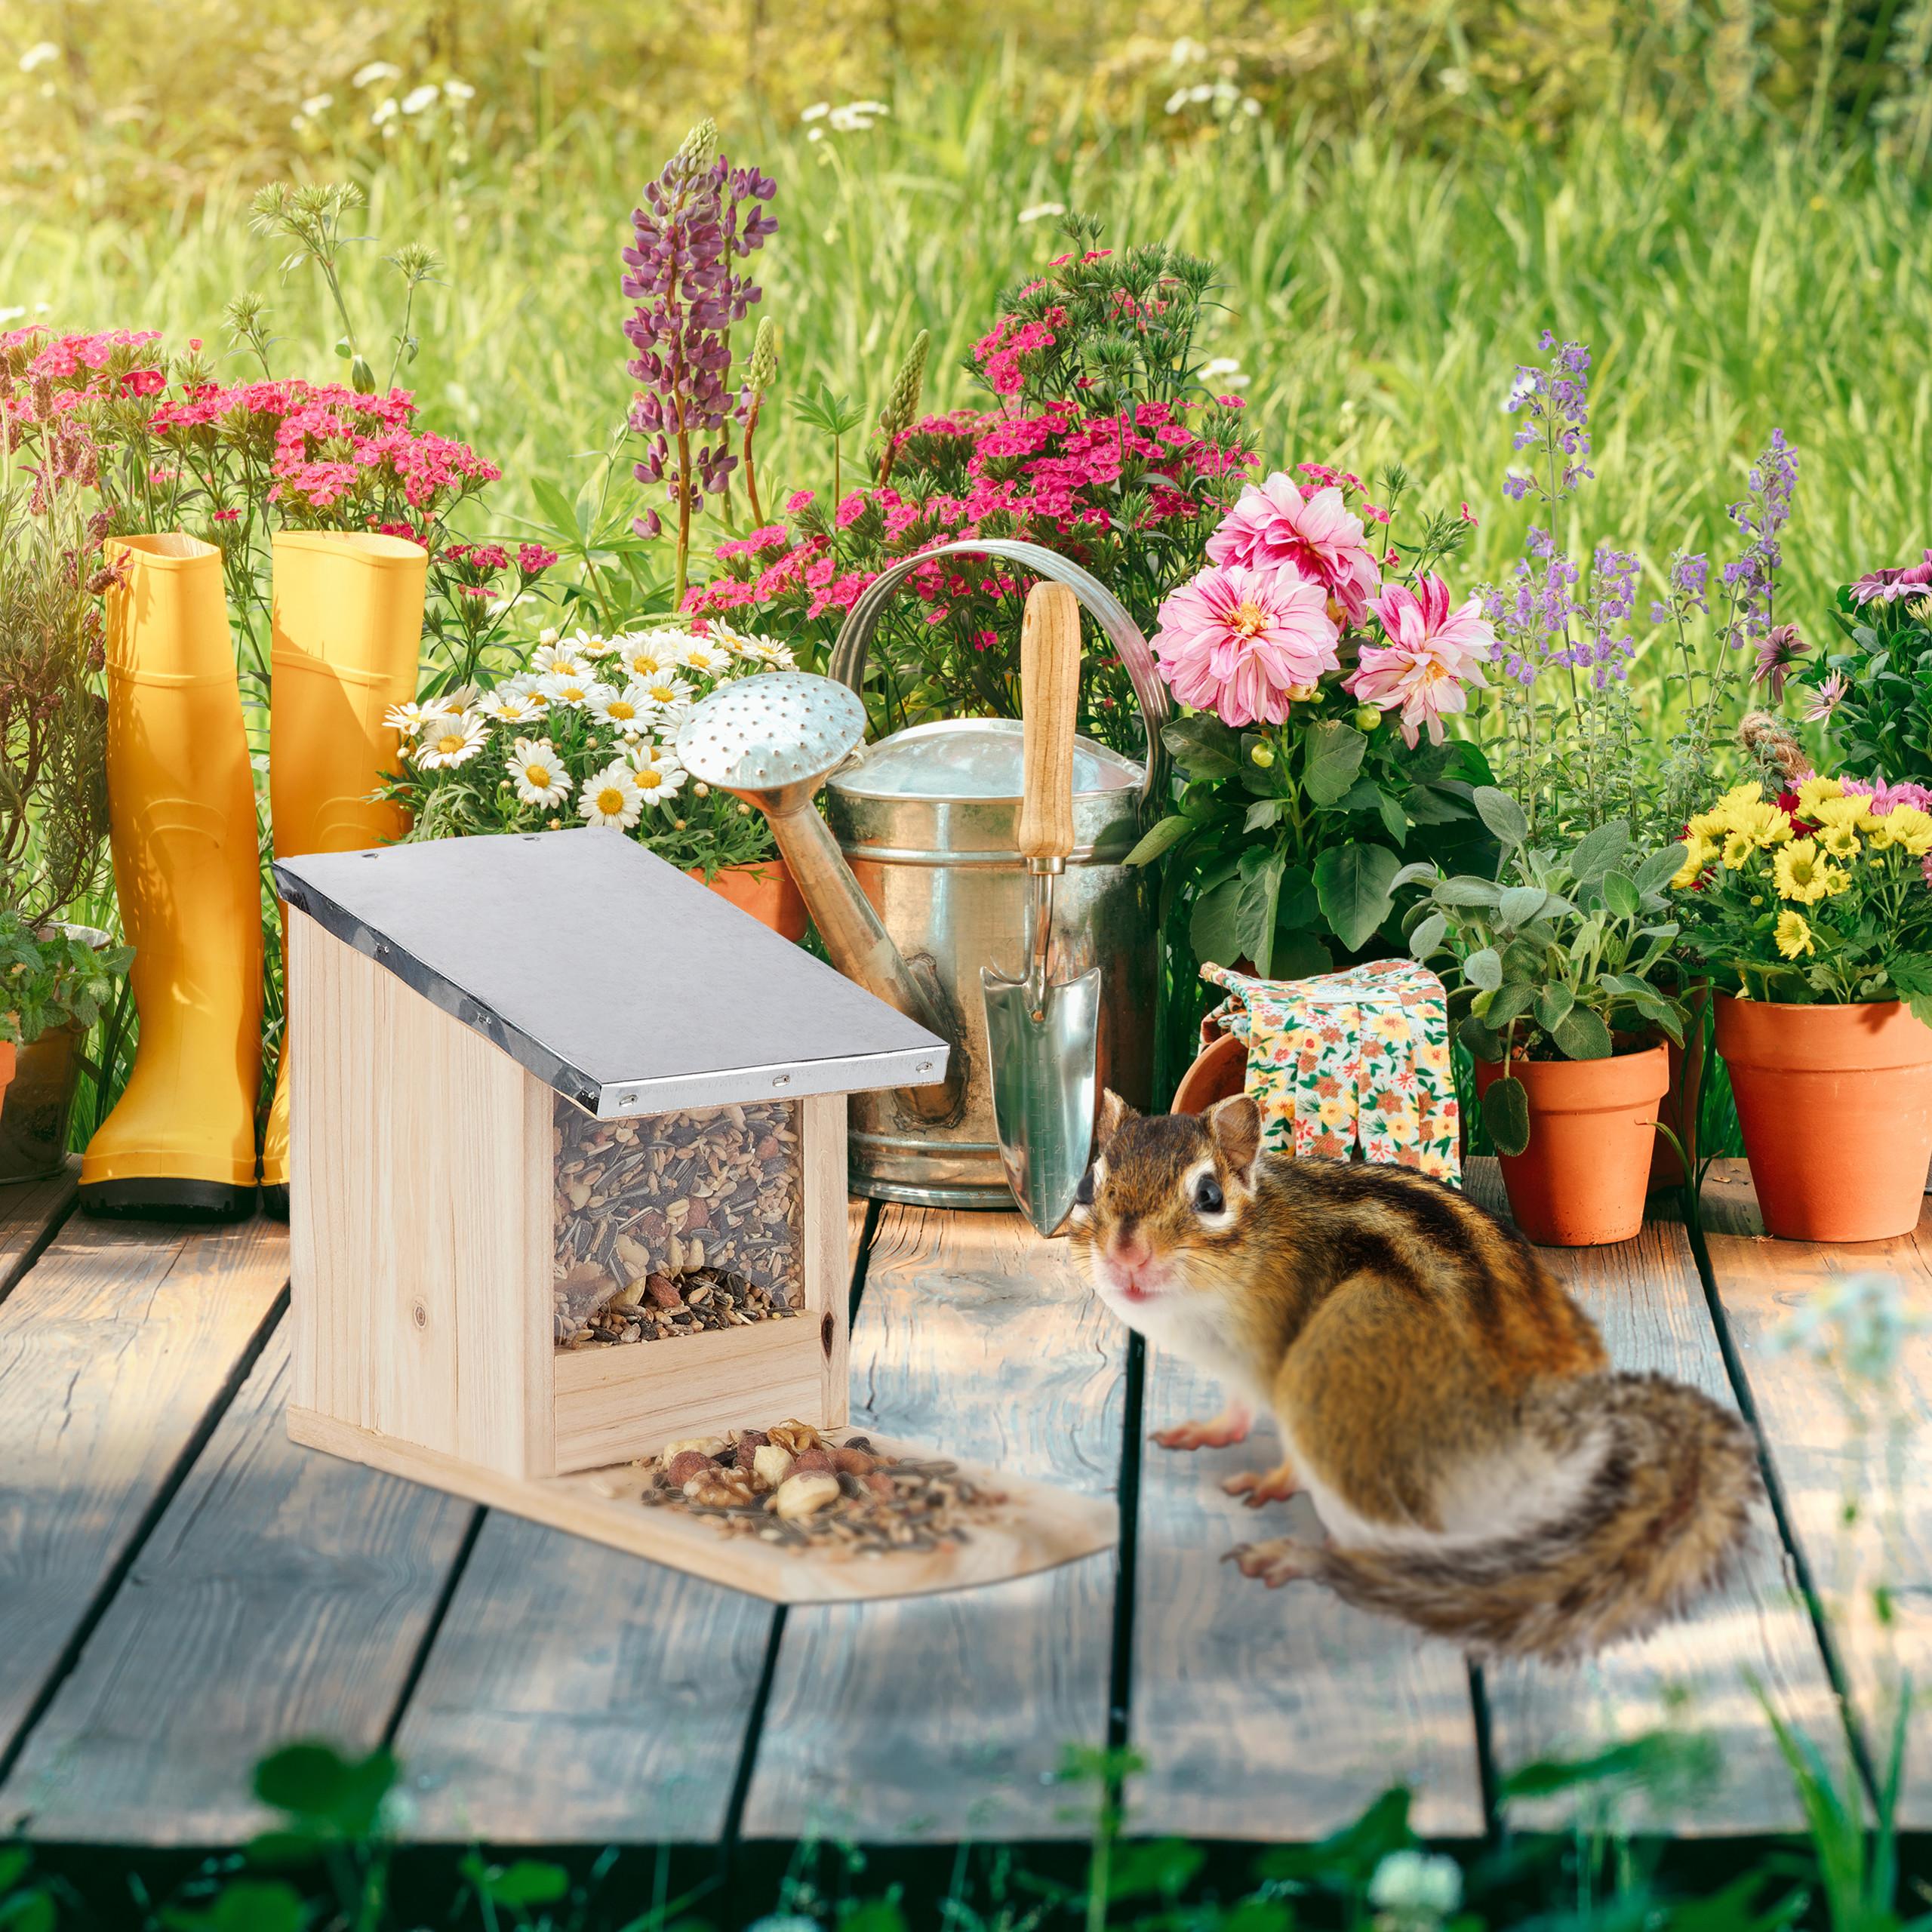 eekhoorn-voederhuisje-metalen-dak-hout-voederhuis-voederkast miniatuur 4